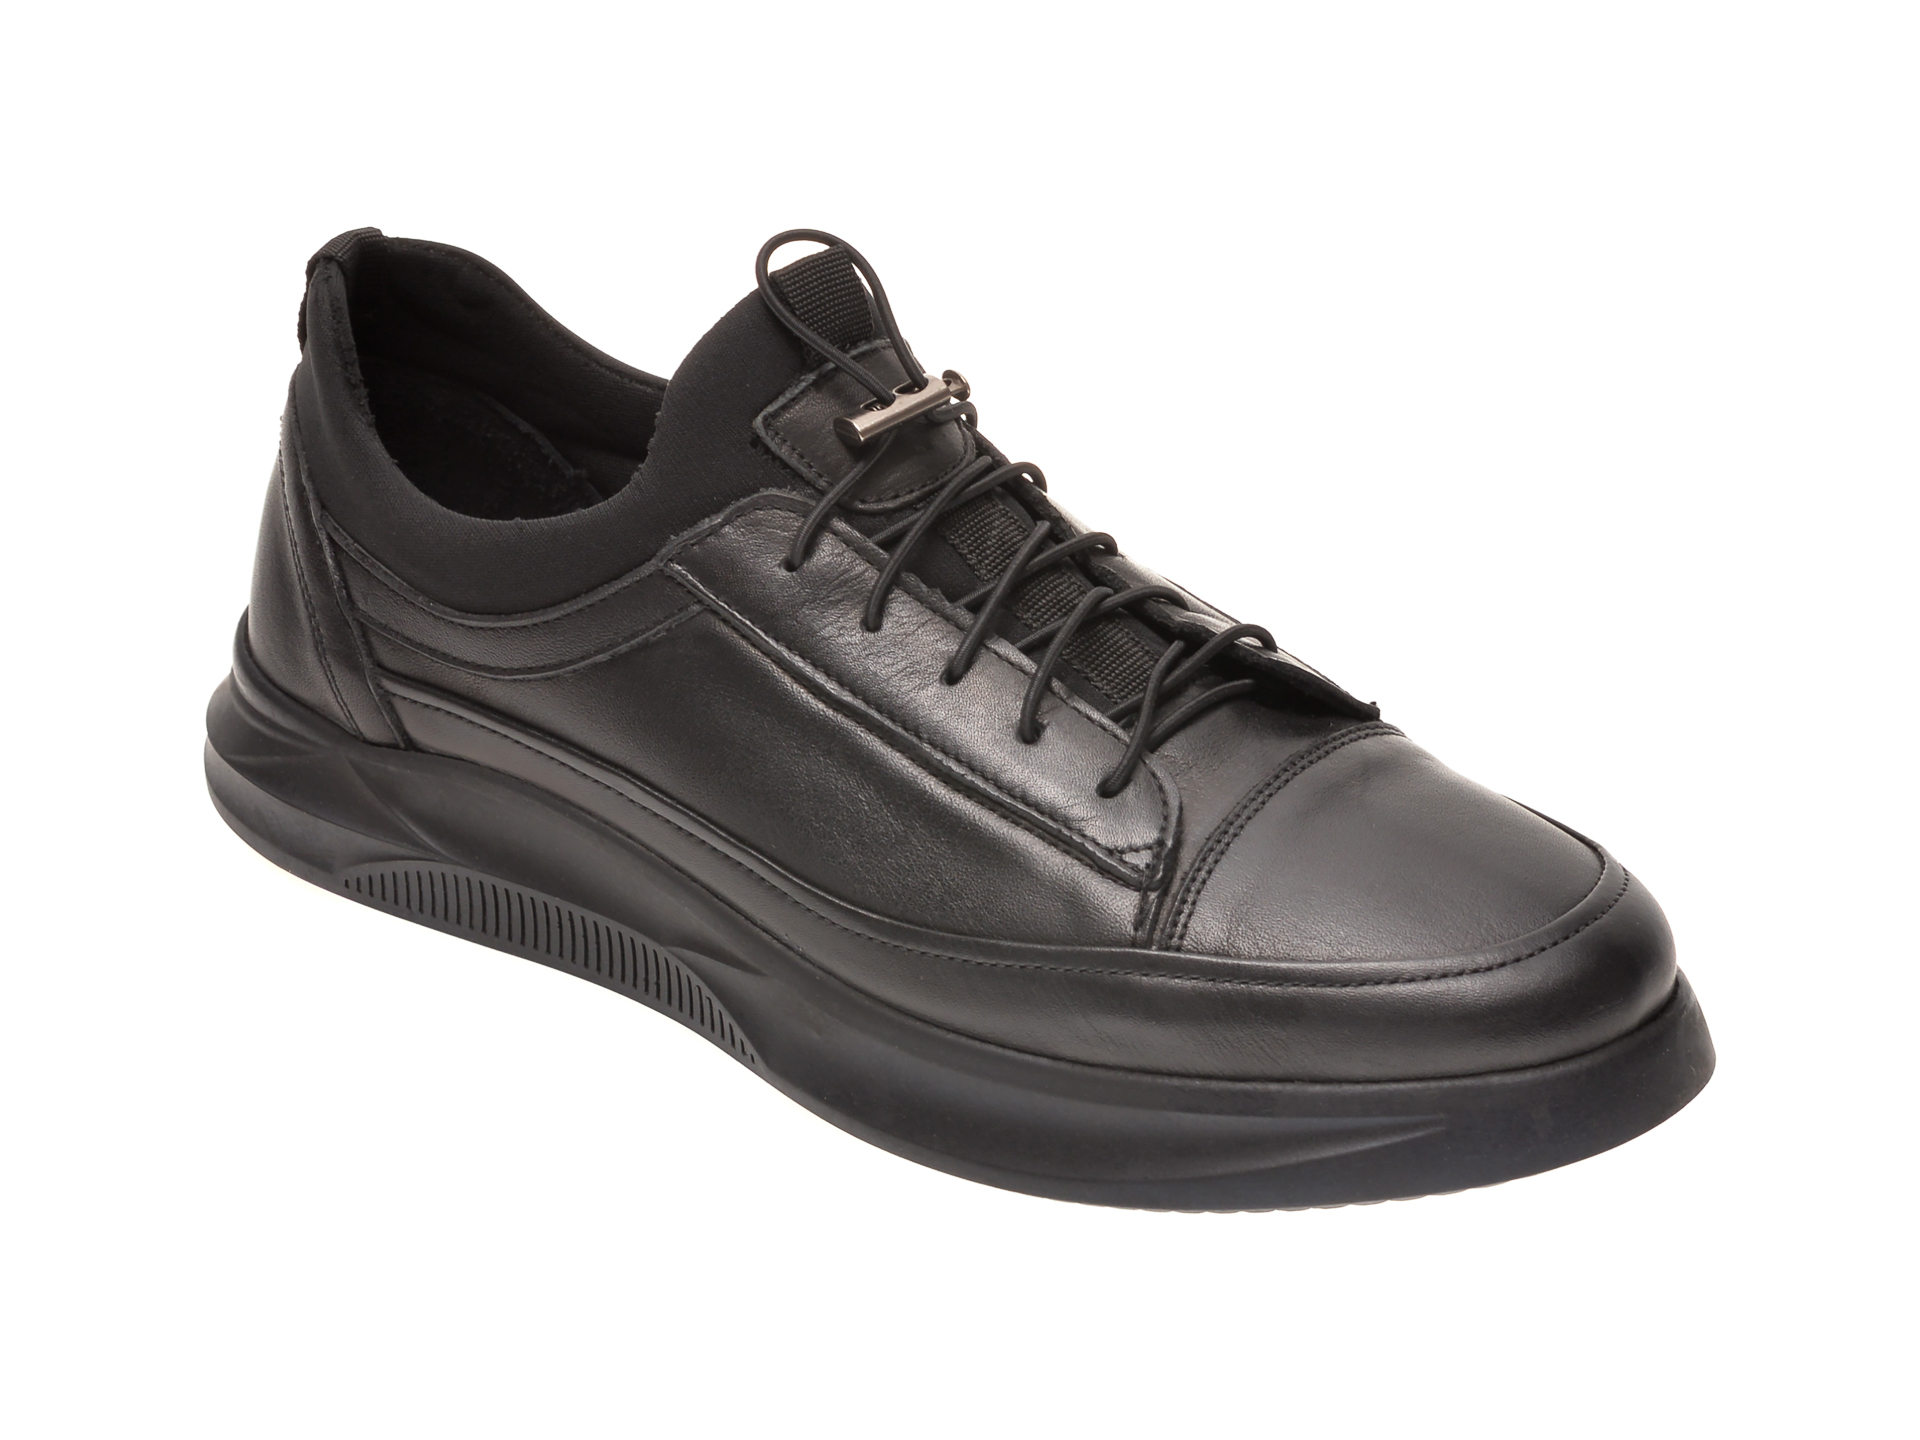 Pantofi OTTER negri, M5794, din piele naturala imagine